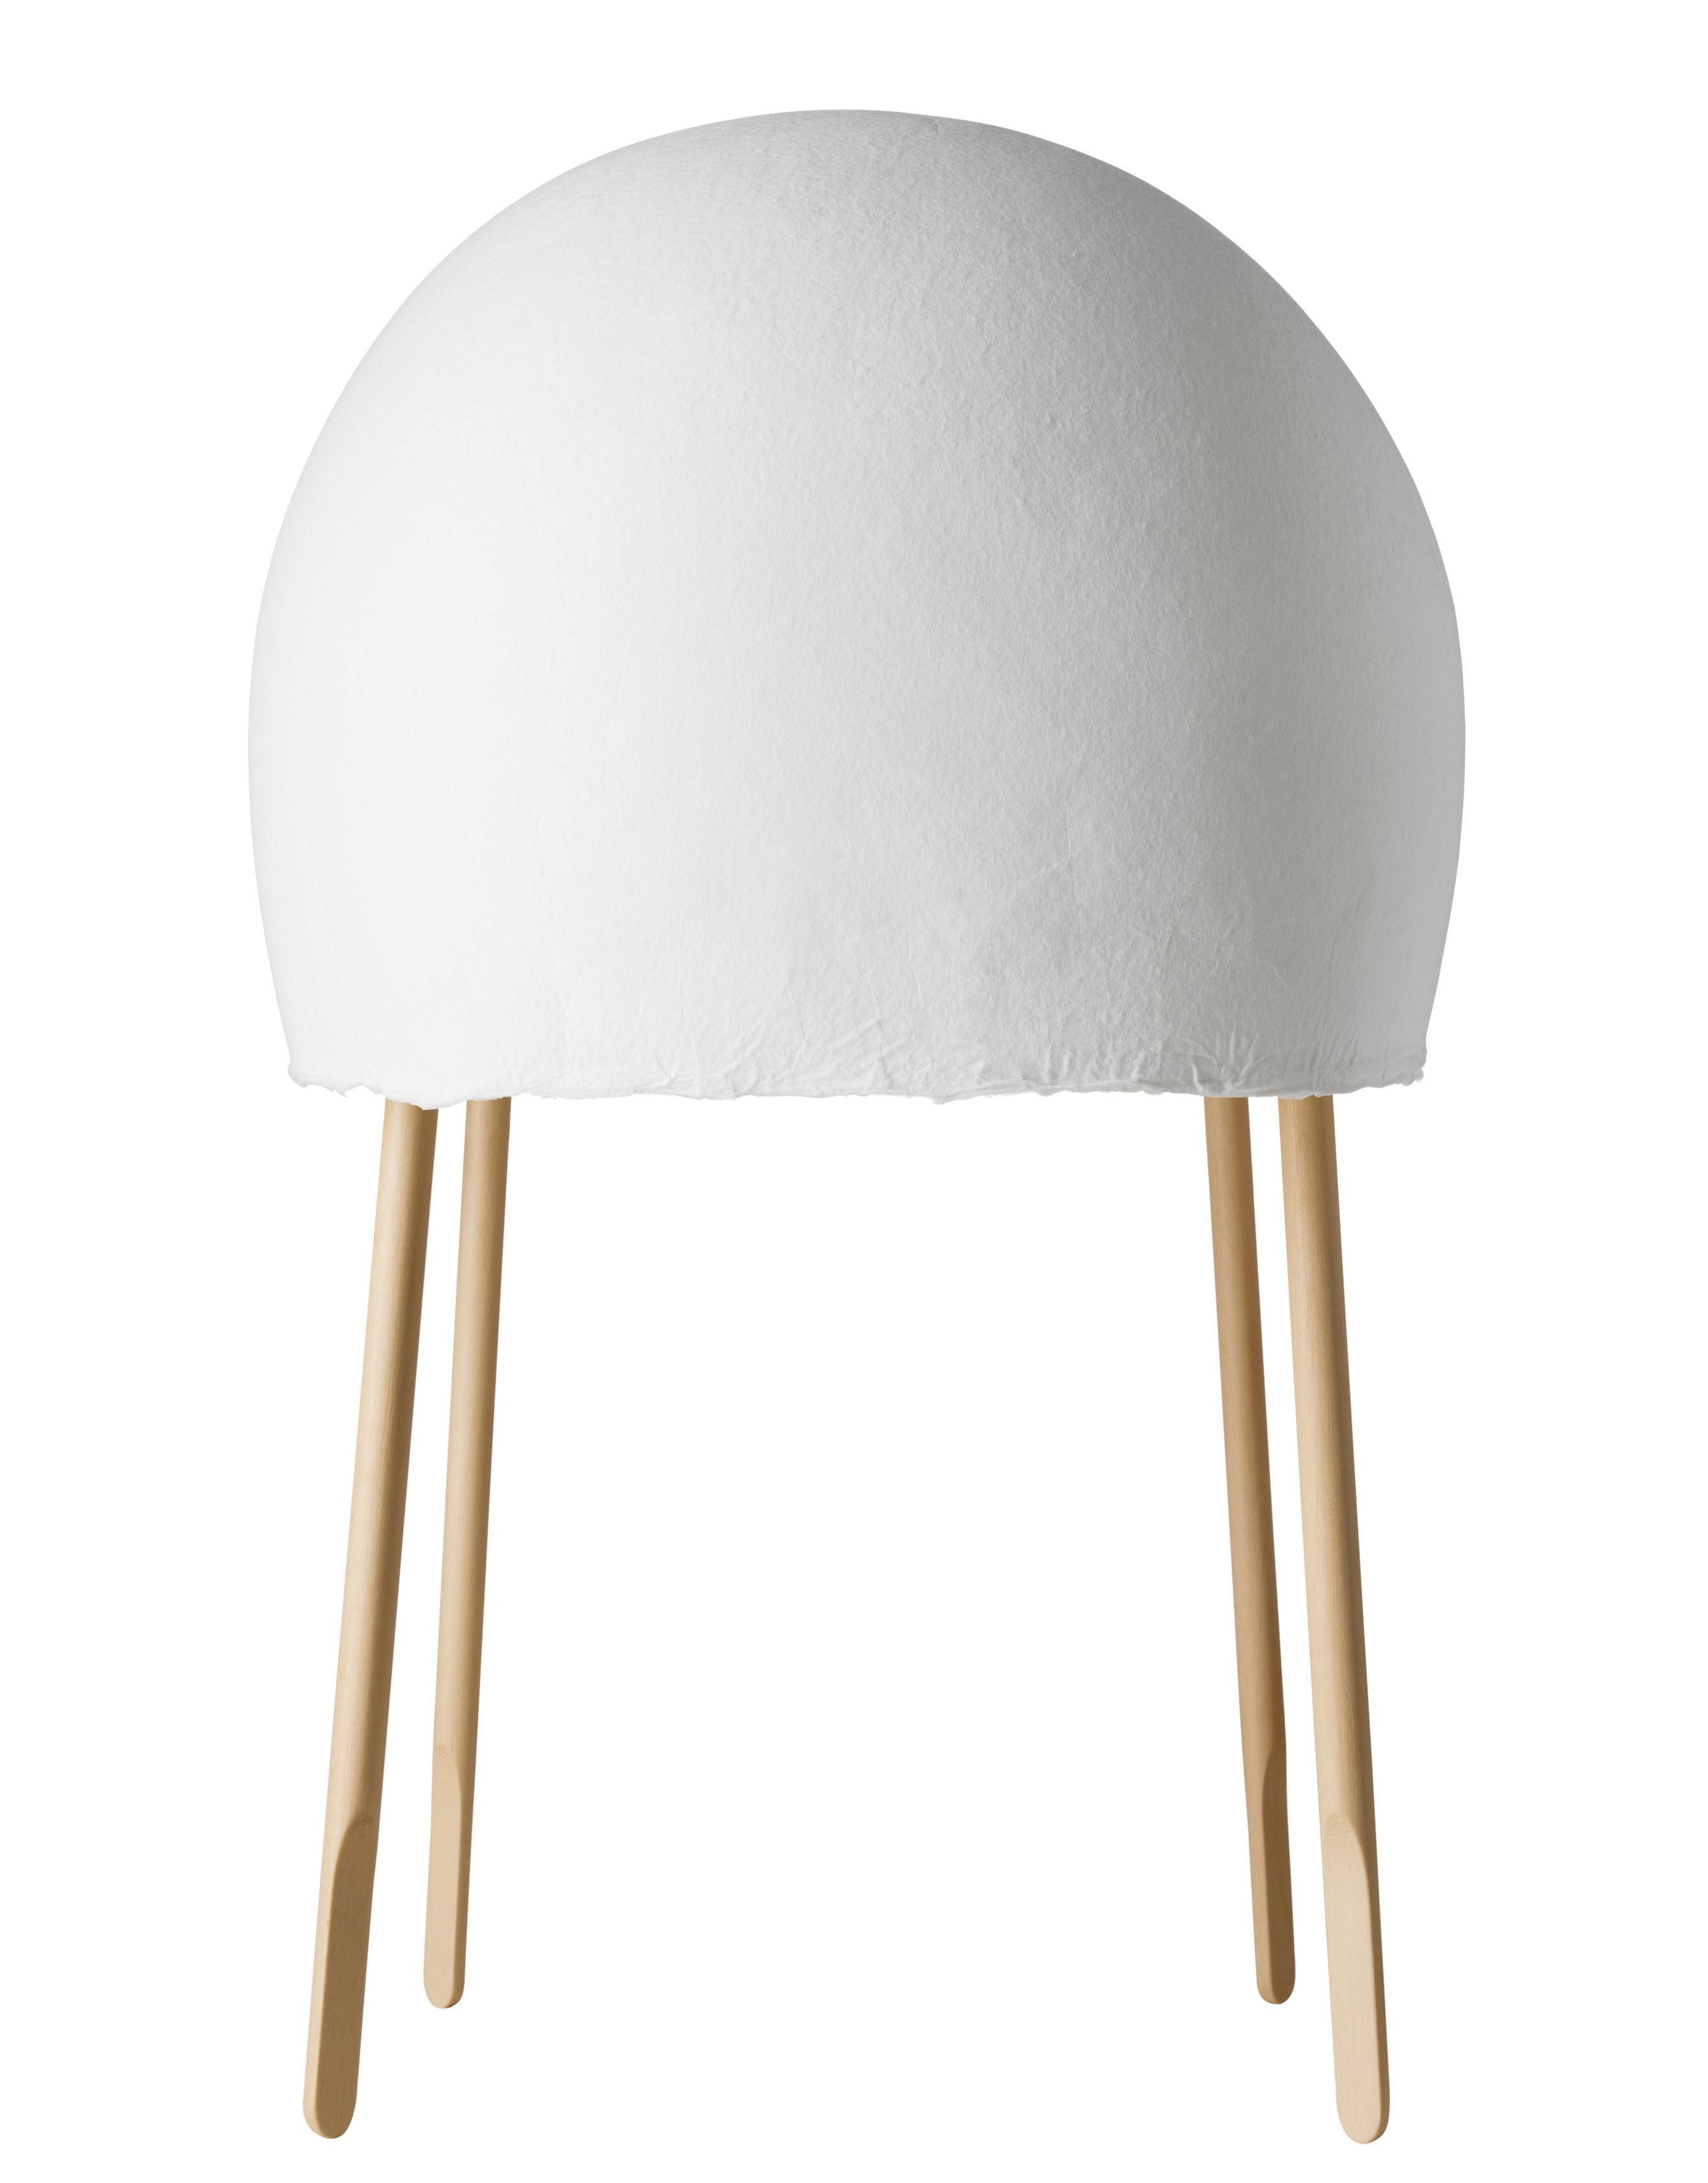 Lighting - Table Lamps - Kurage Table lamp - H 49 cm by Foscarini - White / Natural ash - Beech wood, Ceramic, Washi paper